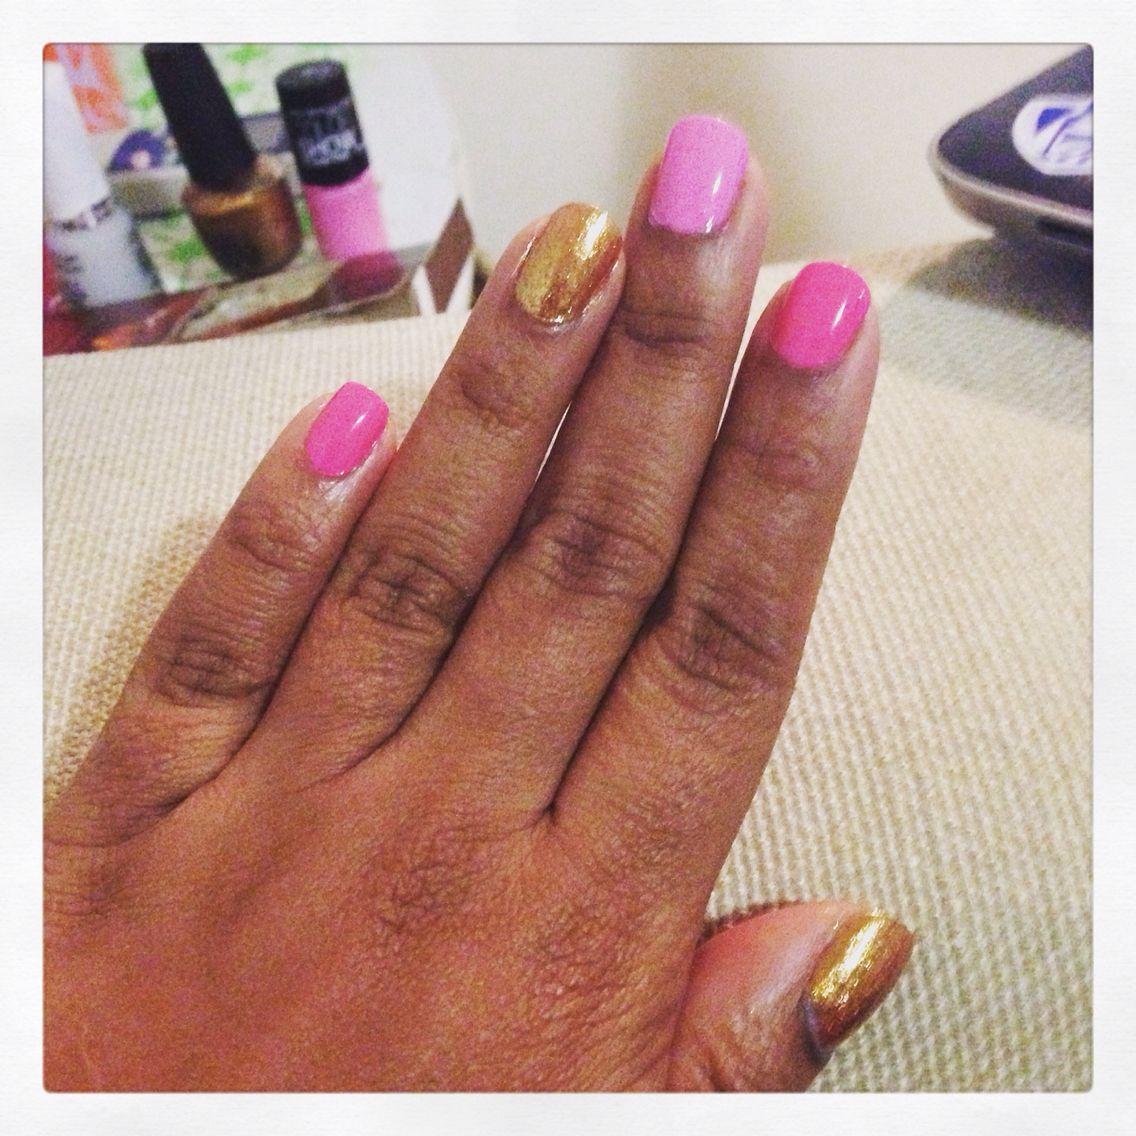 Fancy pink. Fun nails!